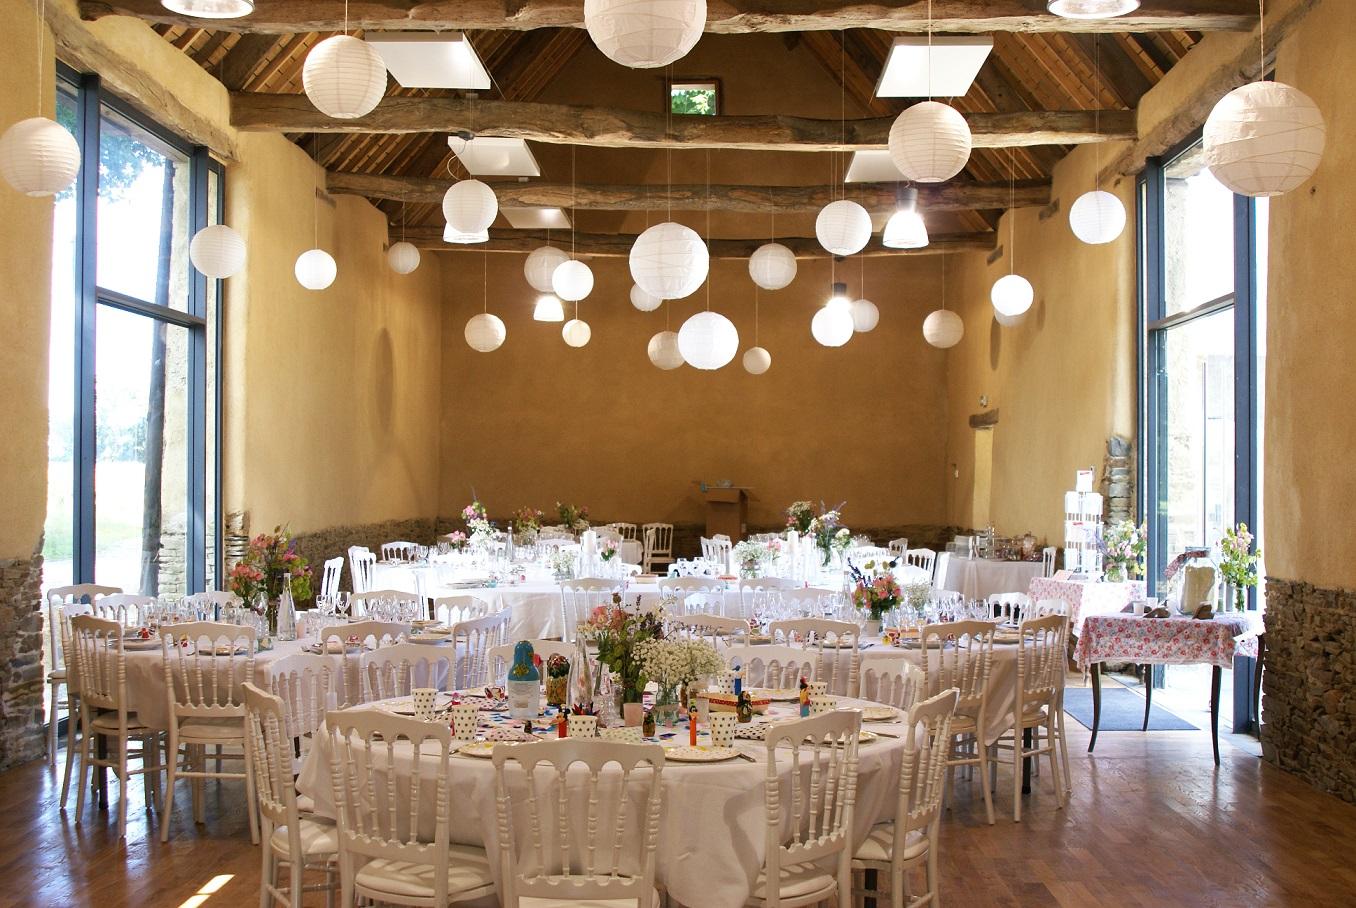 Salle de mariage bretagne le mariage for Chambre d hotes fr